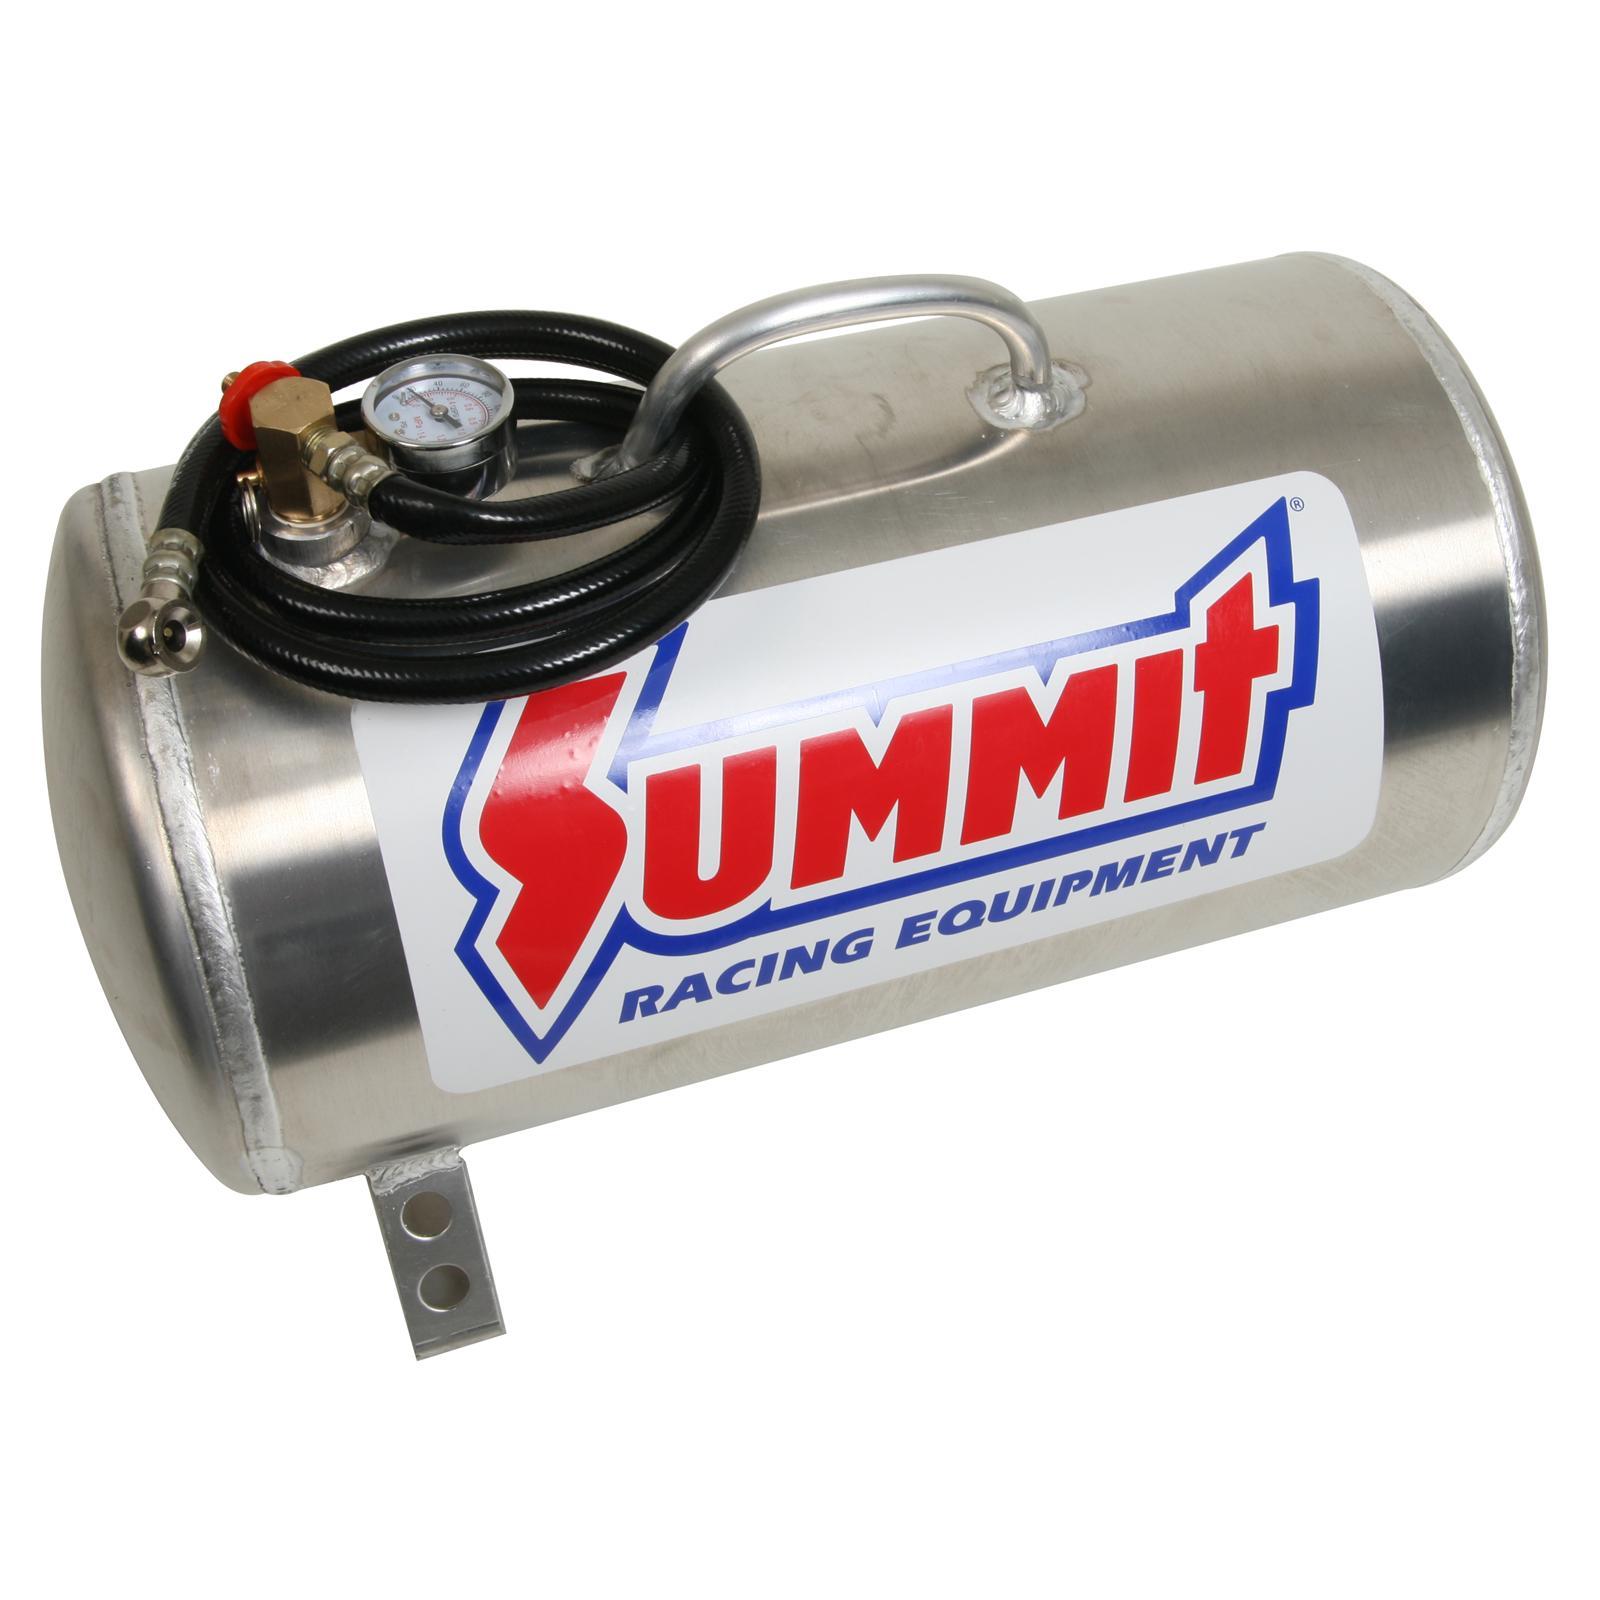 Summit Racing Air Tank 5 Gallons Natural Hose Pressure Gauge Each  #B2191C